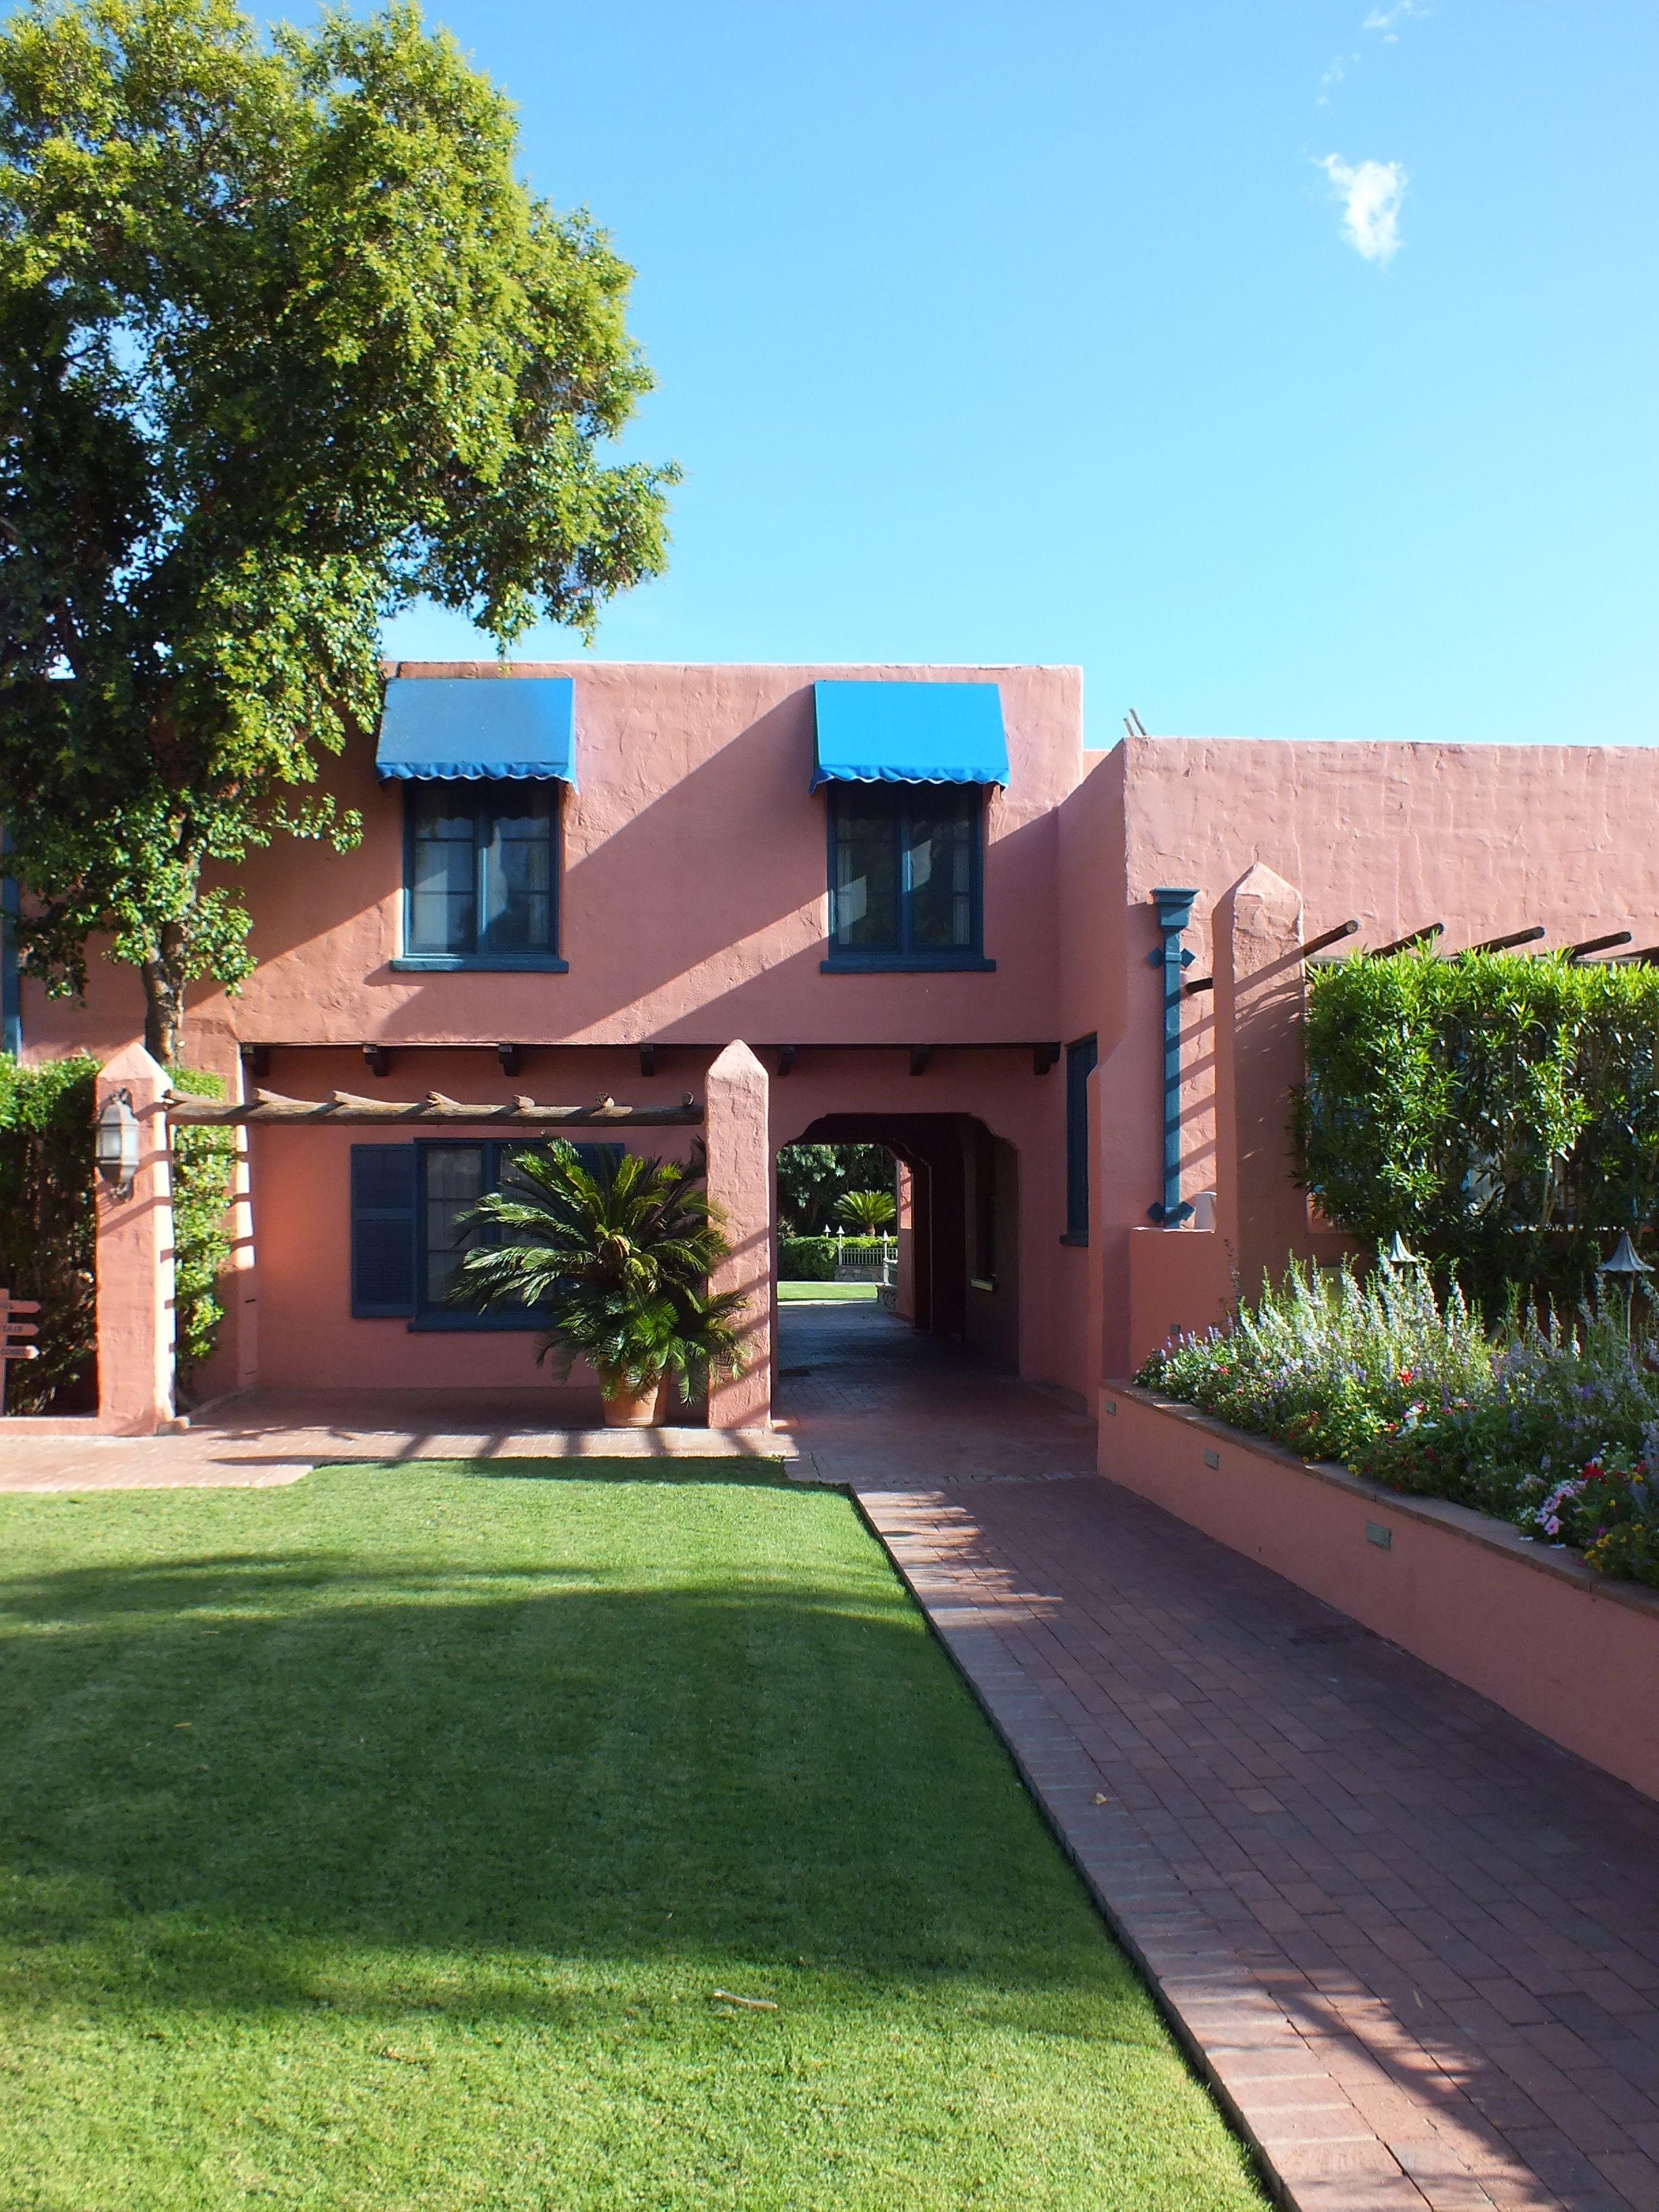 Arizona Inn Tucson Captivating Color In 2019 Arizona Tucson